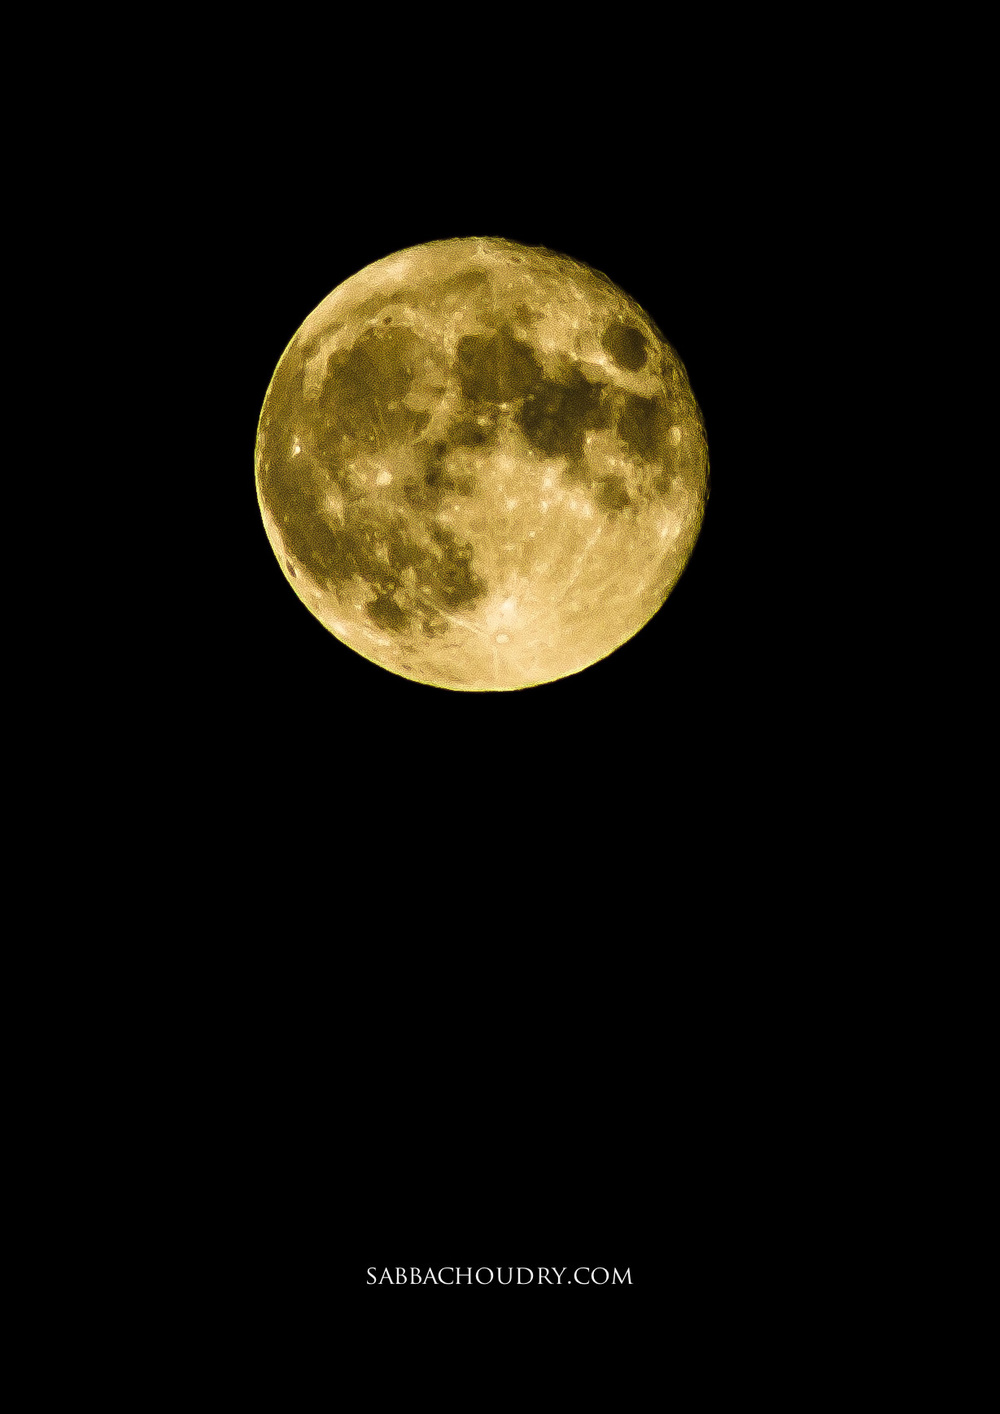 Full moon 7th November 2014, London, UK